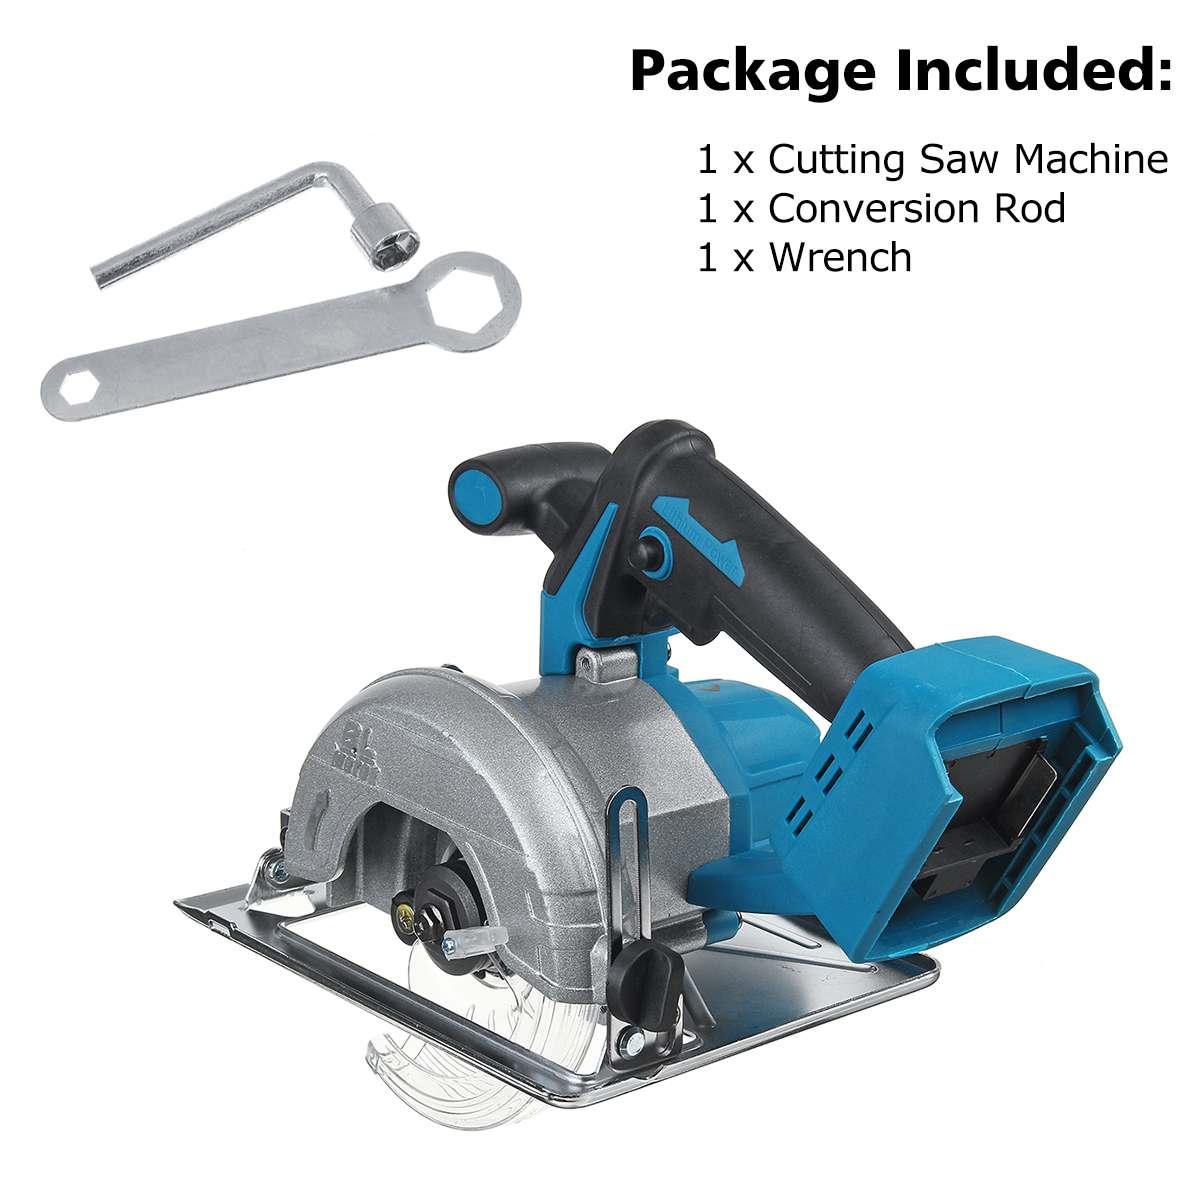 home improvement : Cylinder Piston Kit 41mm for McCulloch Chainsaw CS350 CS390 CS410 Craftsman 358381800 504735104 502625002